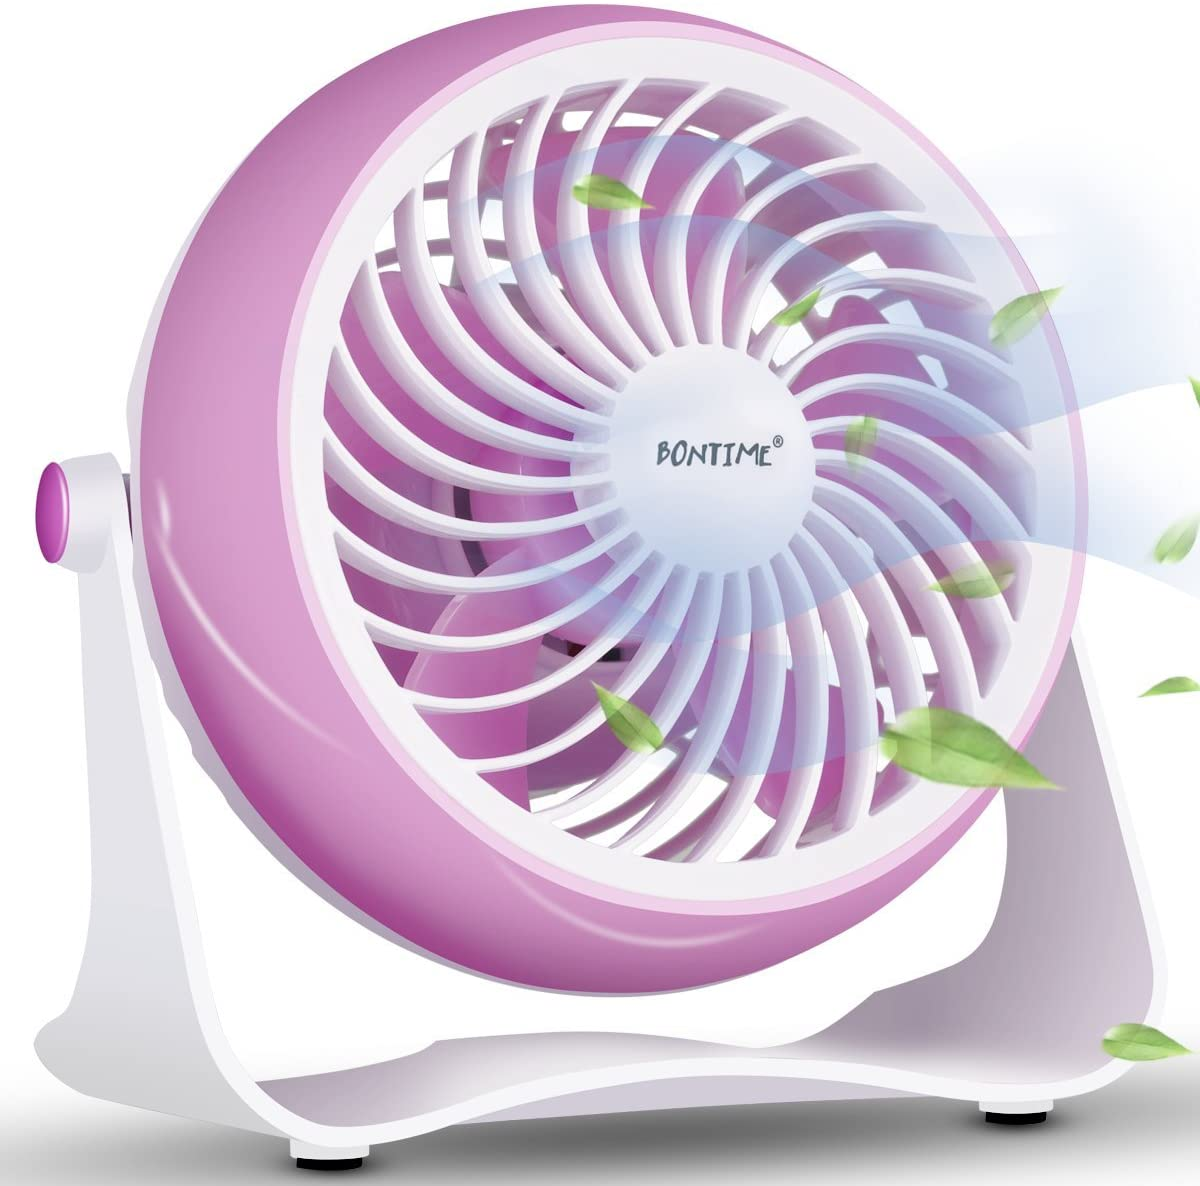 BONTIME Mini Desk Fan - Desktop Personal Fan, USB Powered Fan with Adjustable Tilt, Brushless Motor Perfect for Any Desktop Area, 4 Inches (Light Pink)